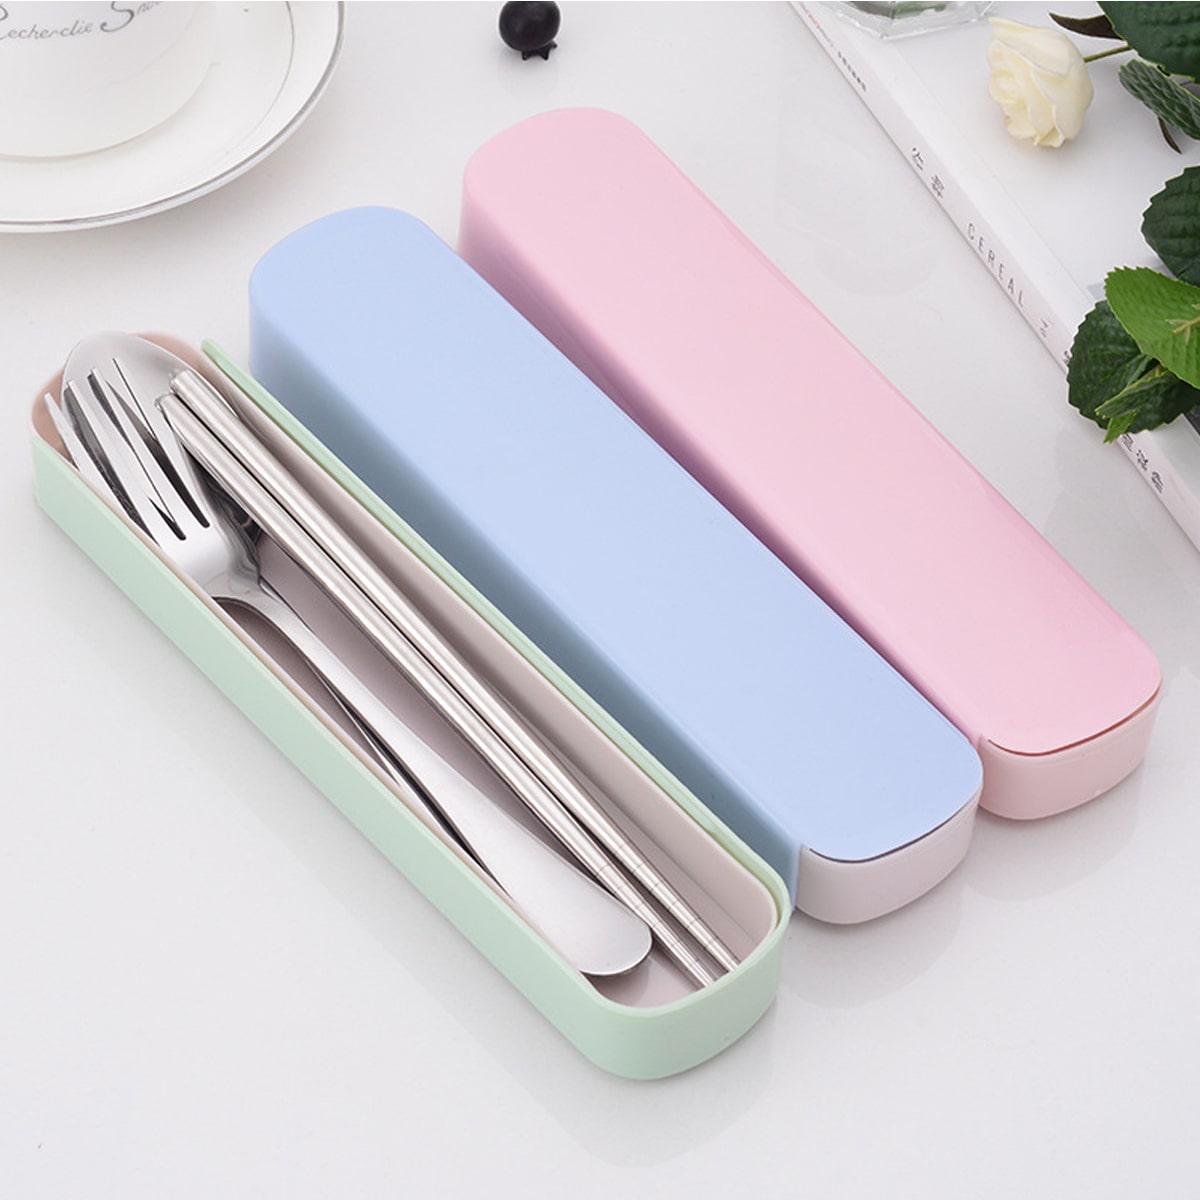 4pcs Random Color Stainless Steel Cutlery Set